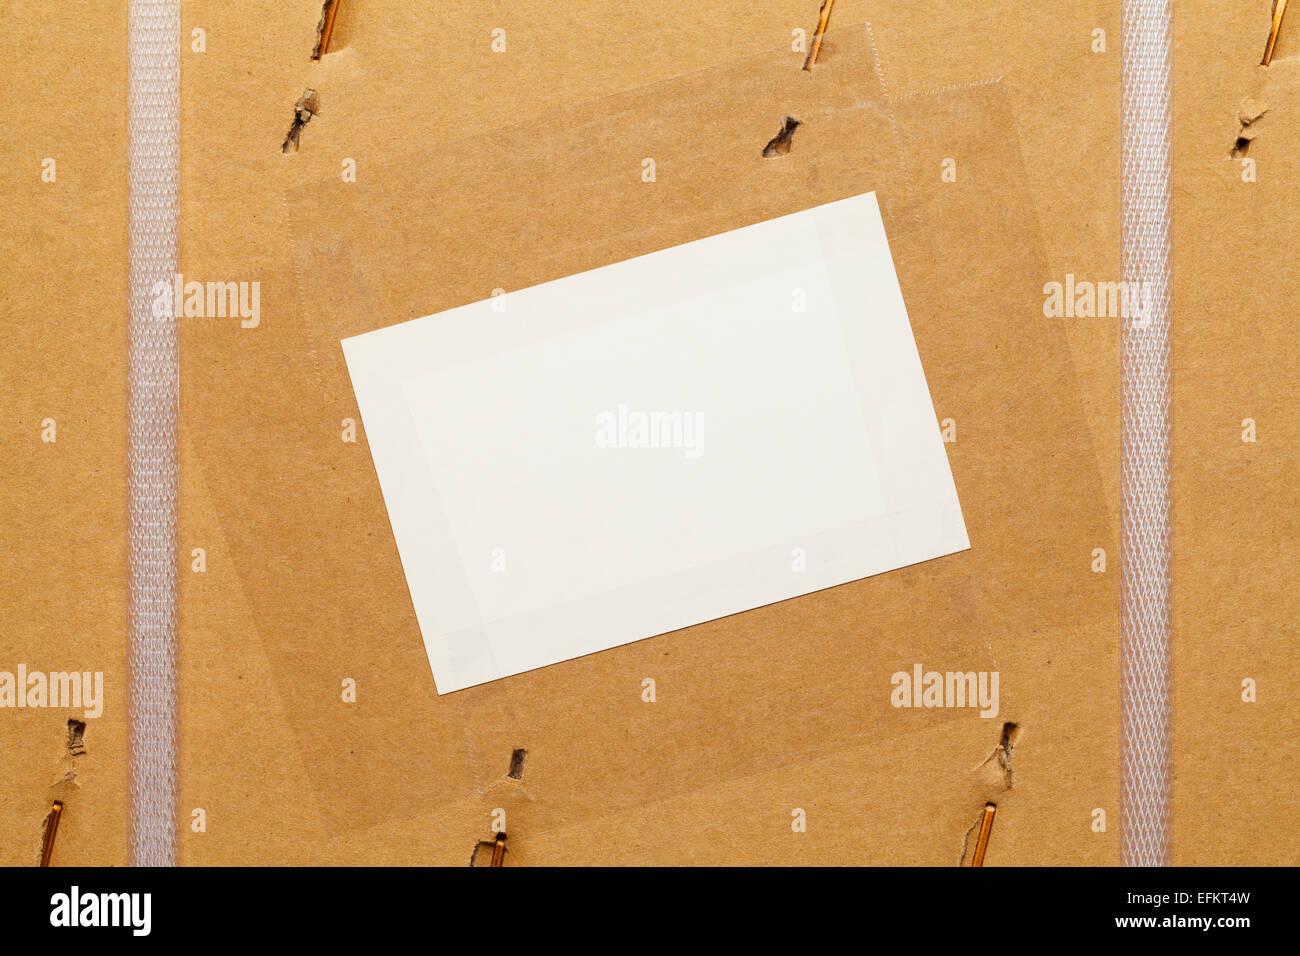 Staples Stock Photos & Staples Stock Images - Alamy